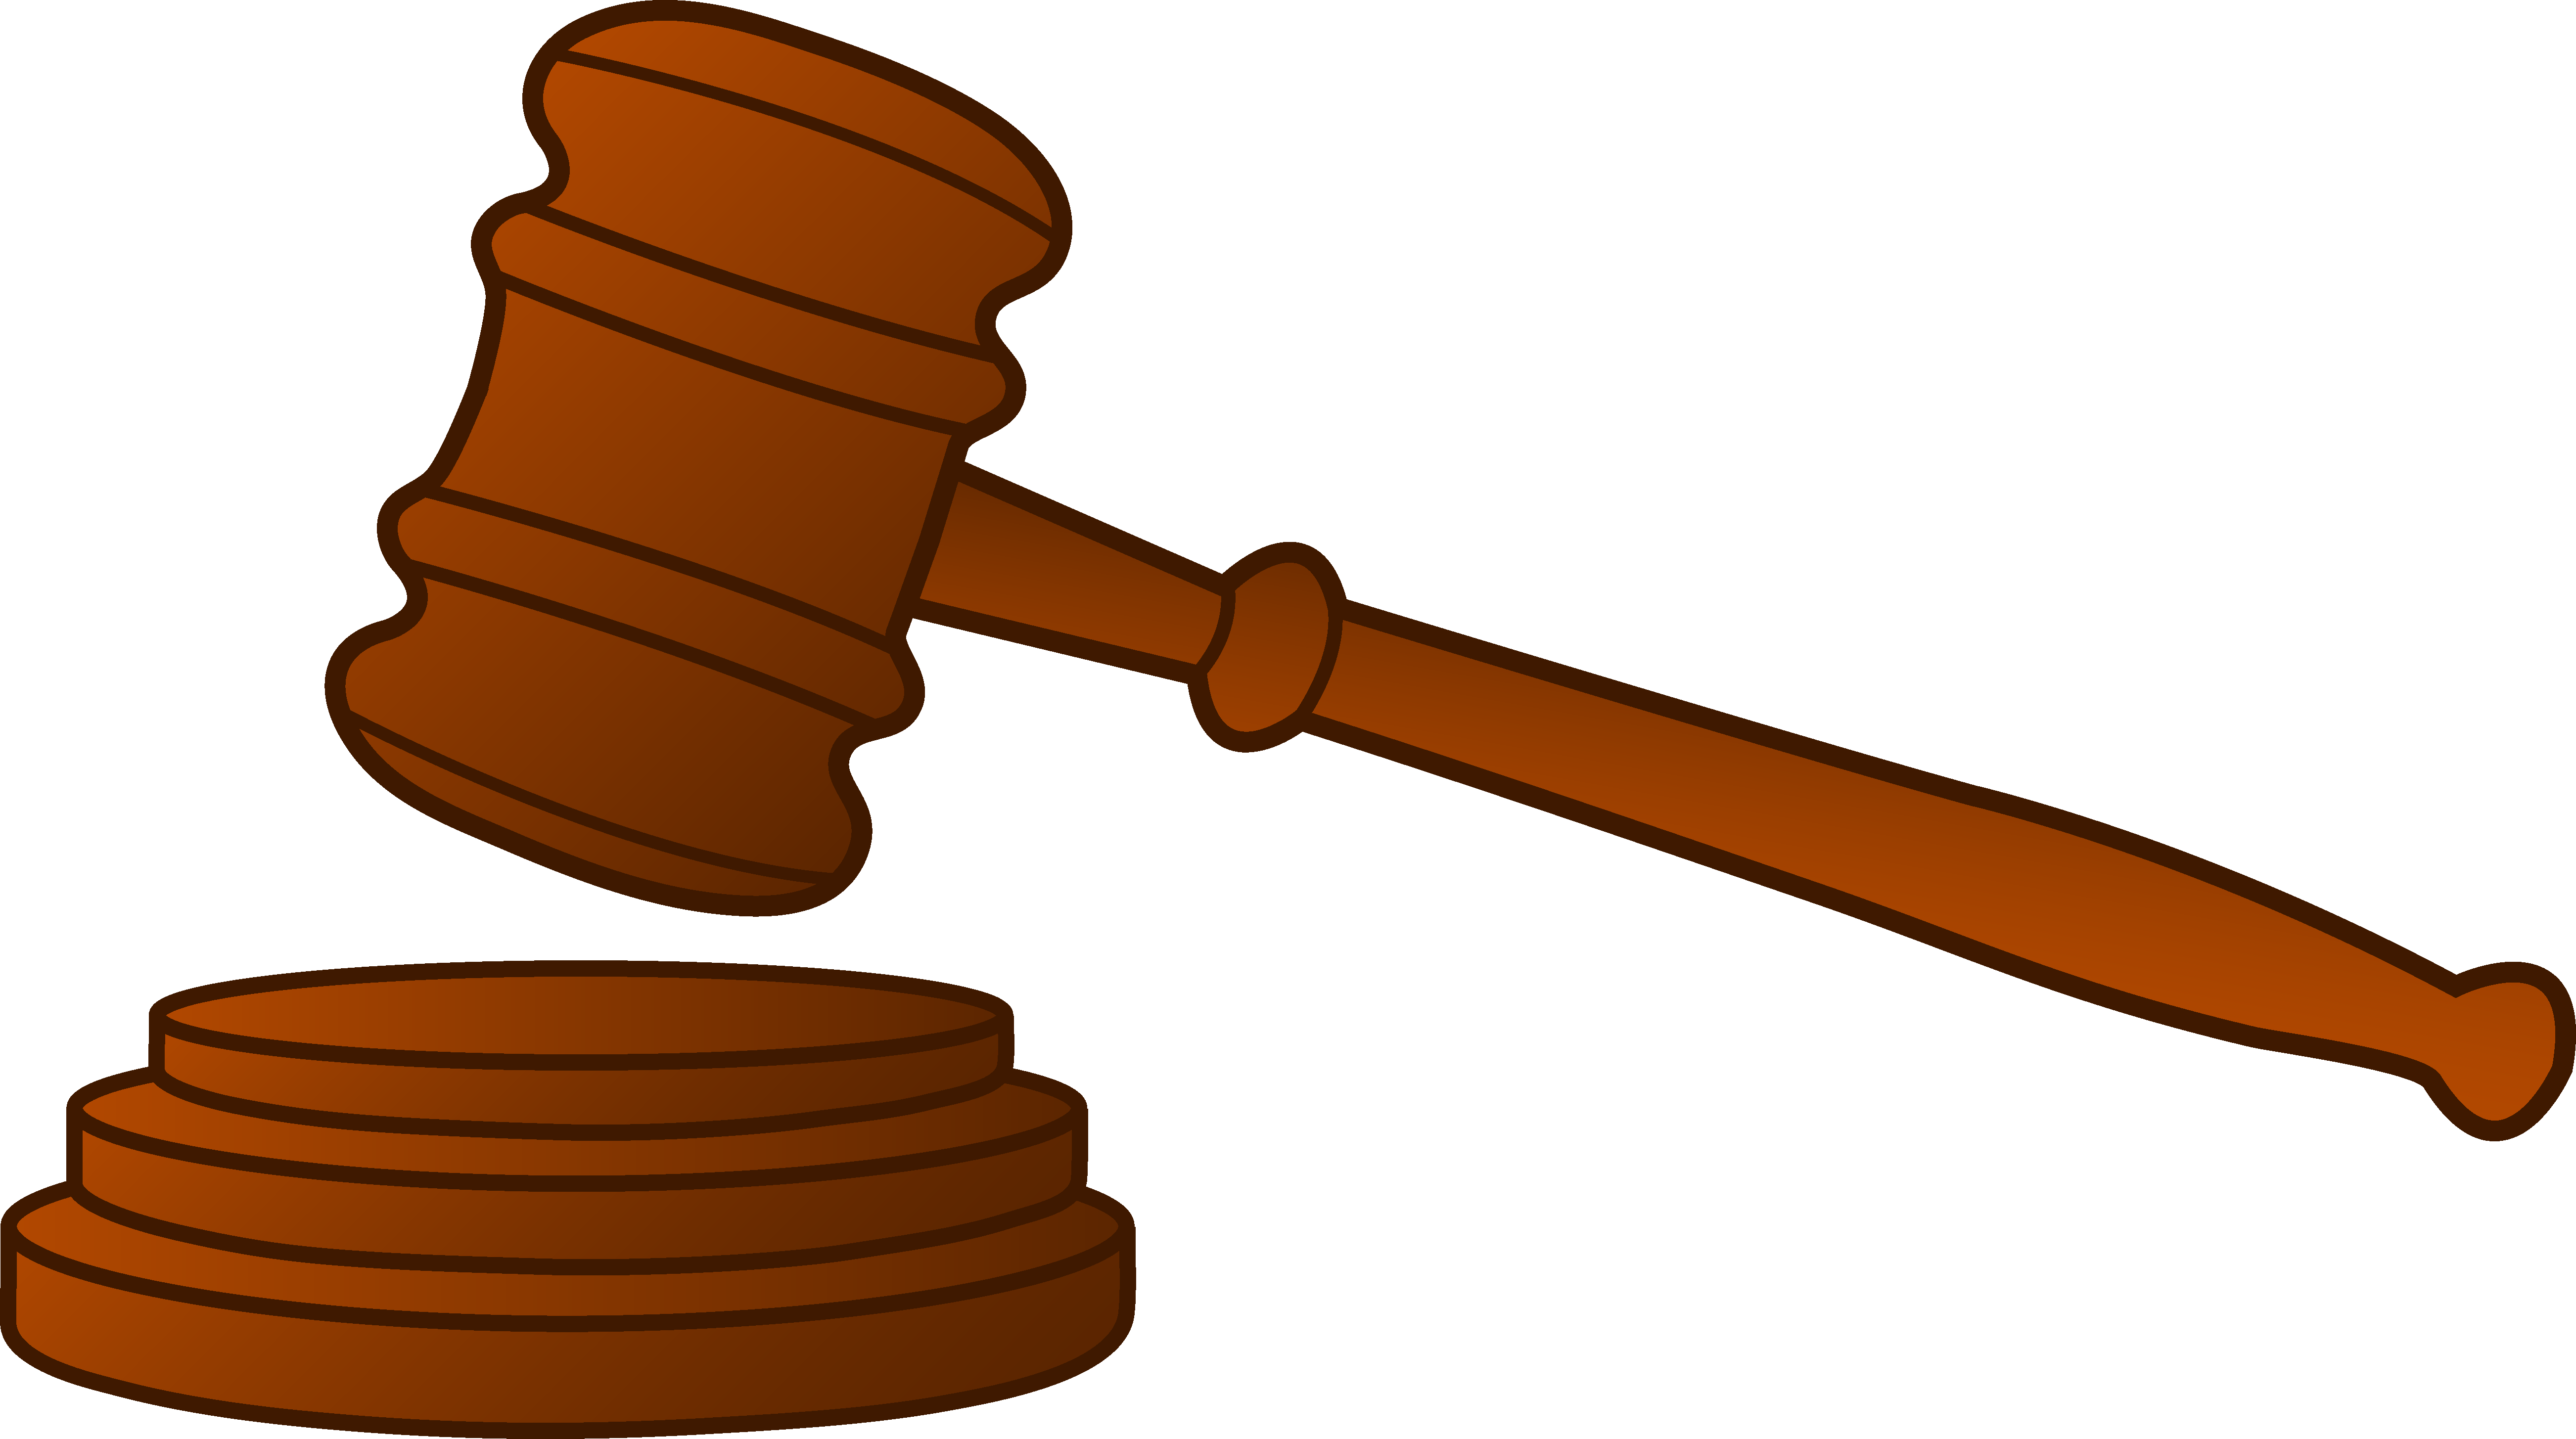 Judge Clipart - Cliparts.co